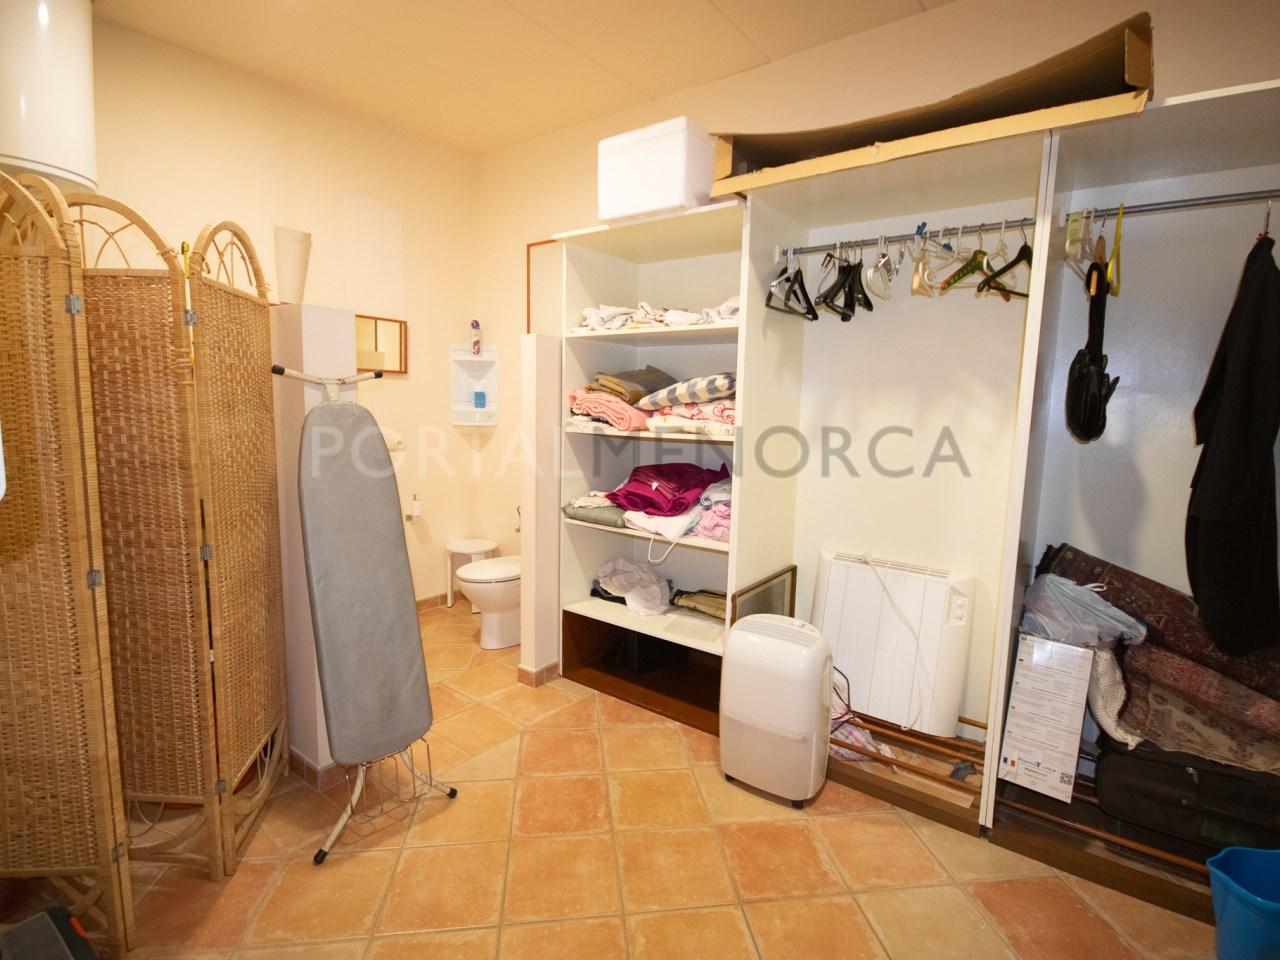 Dressing room/storeroom